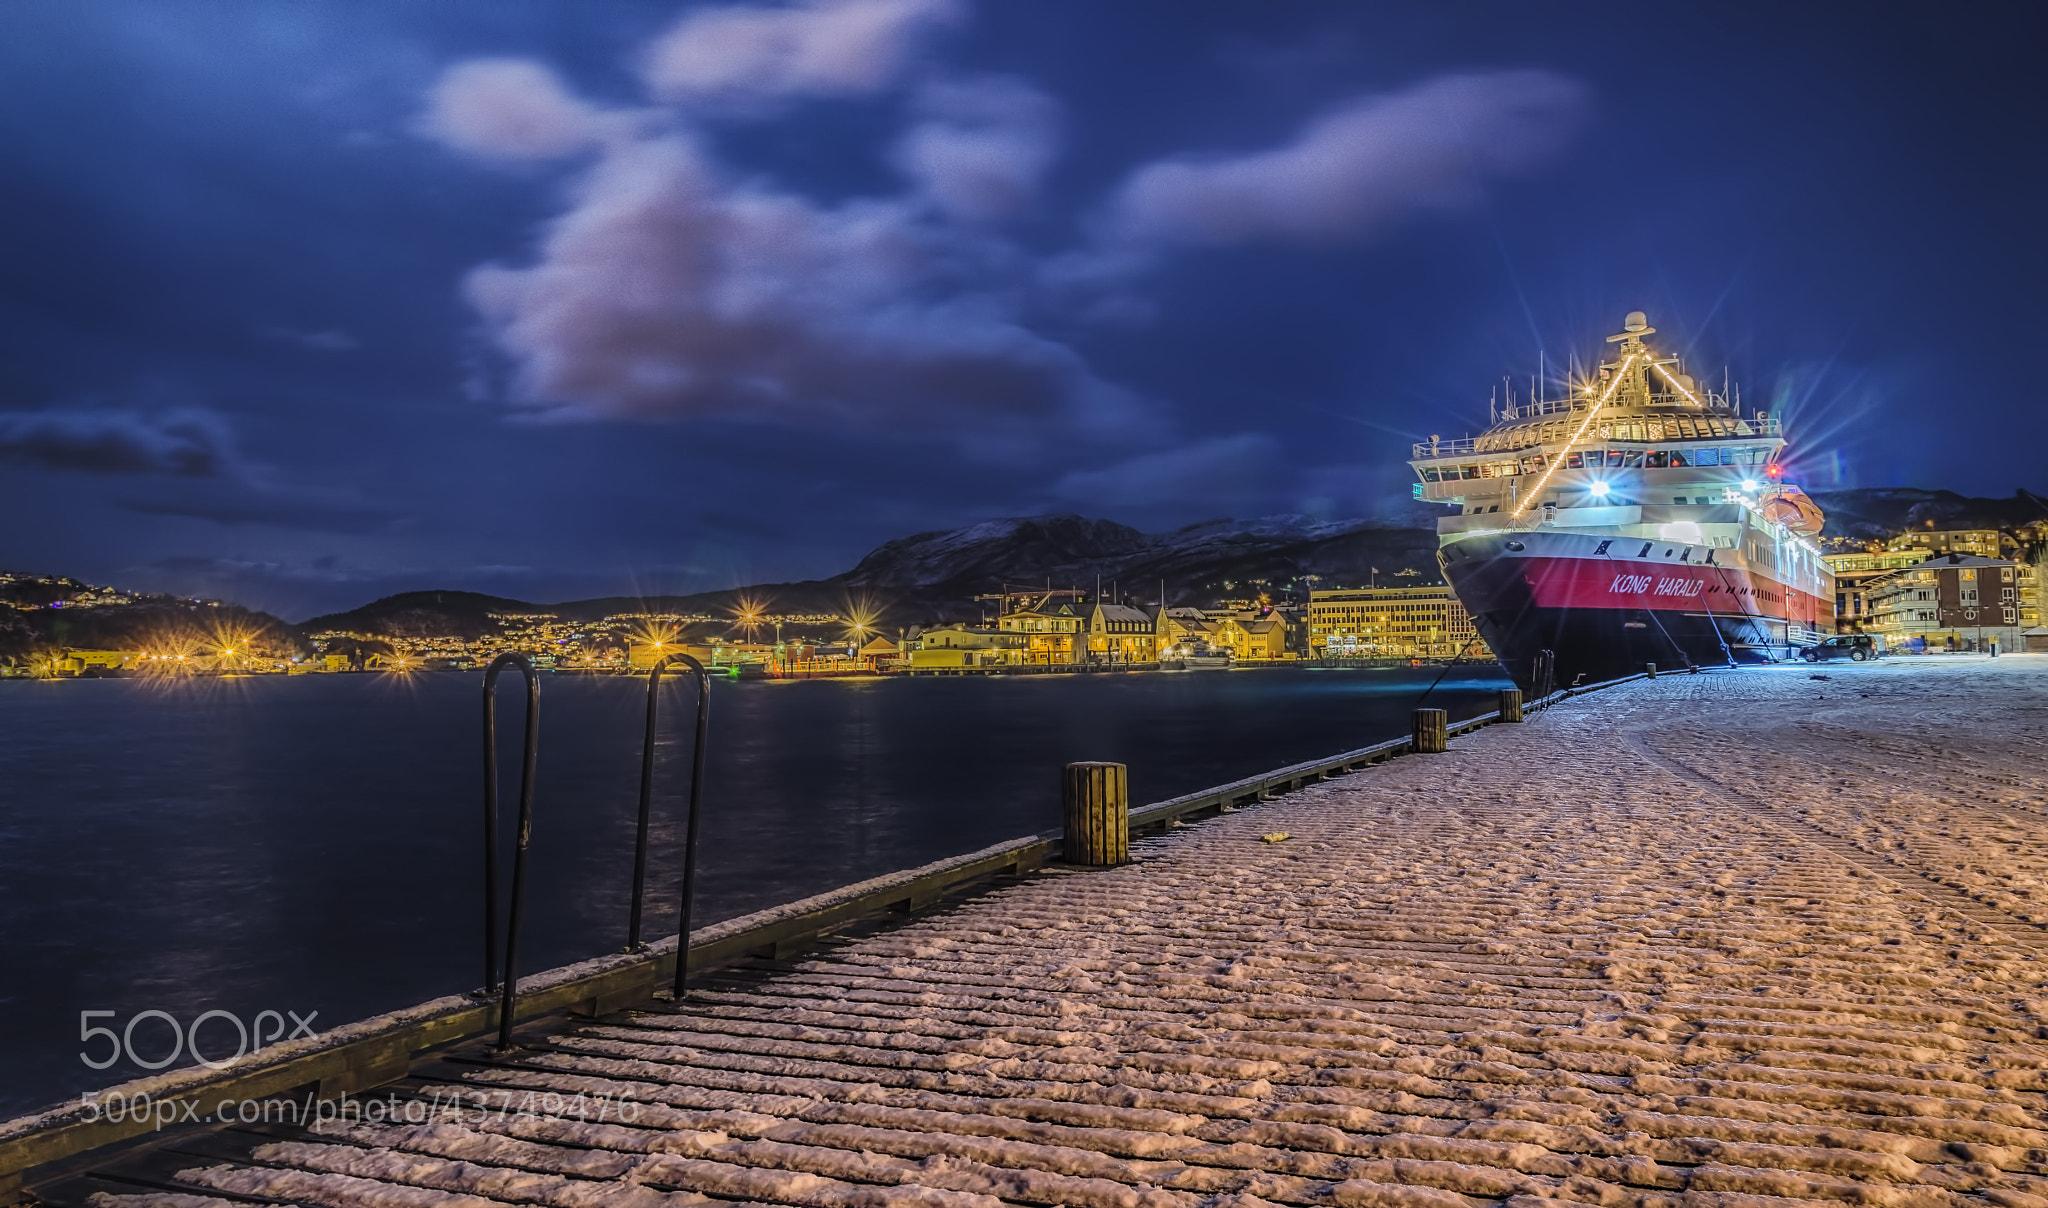 Photograph The Coastal Express by Espen Hanssen on 500px